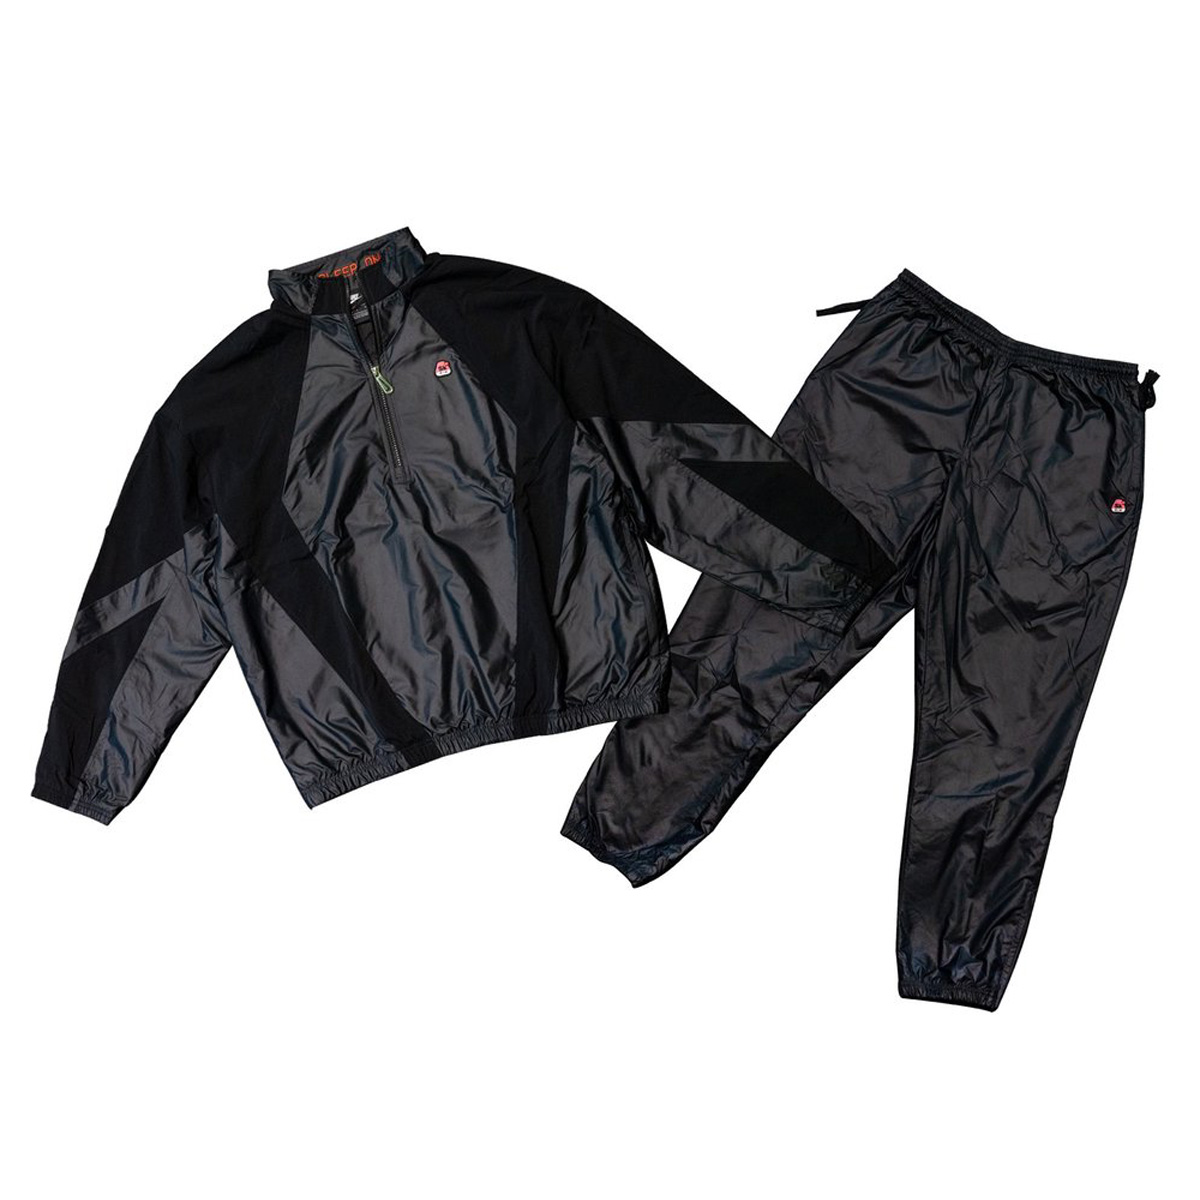 NIKE x SKEPTA NRG TRACKSUIT ナイキ x スケプタ NRG トラックスーツ BLACK av9997-010